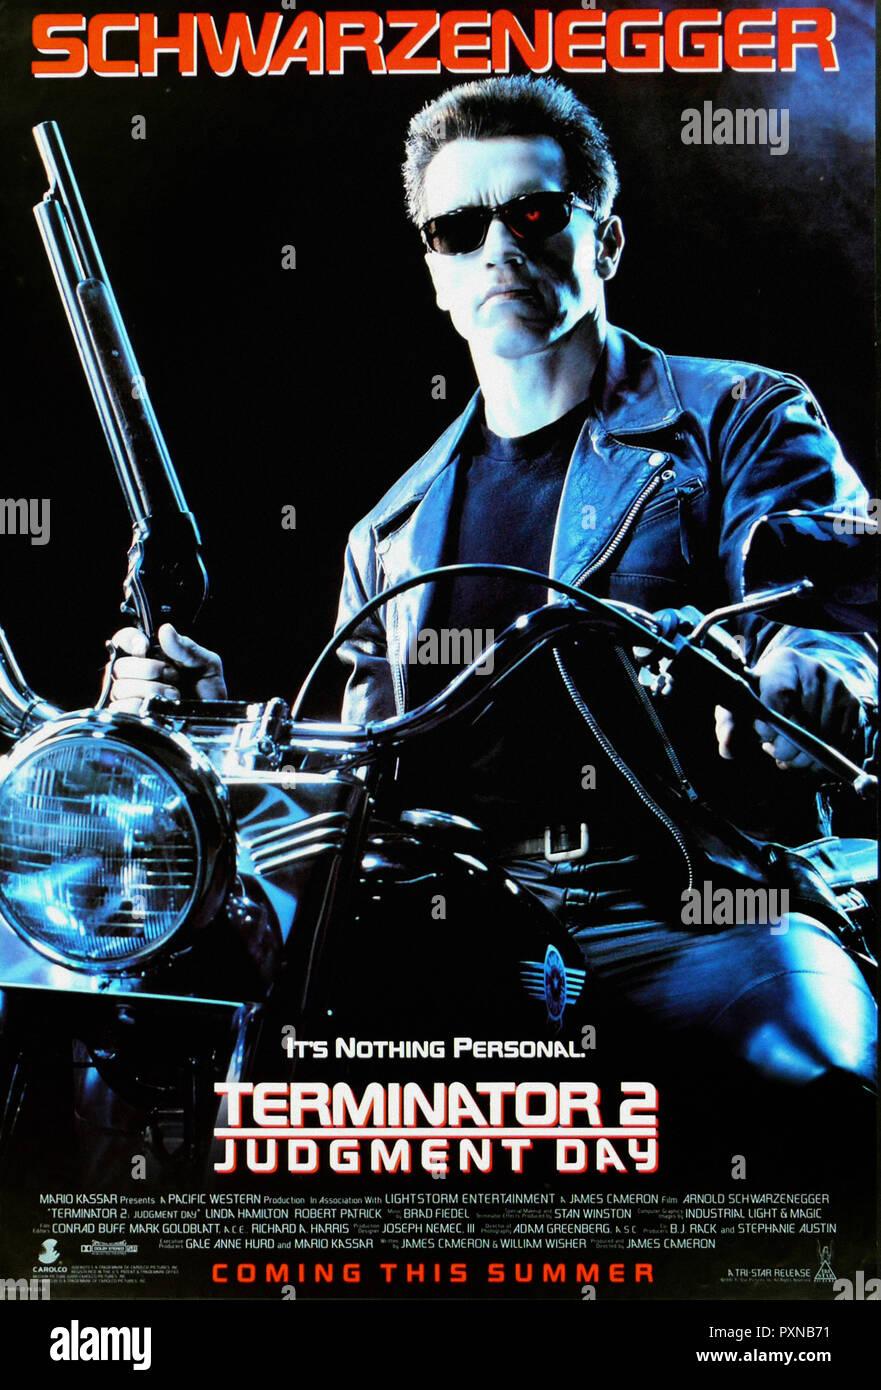 Terminator 2 Judgement Day - Original movie poster - Stock Image